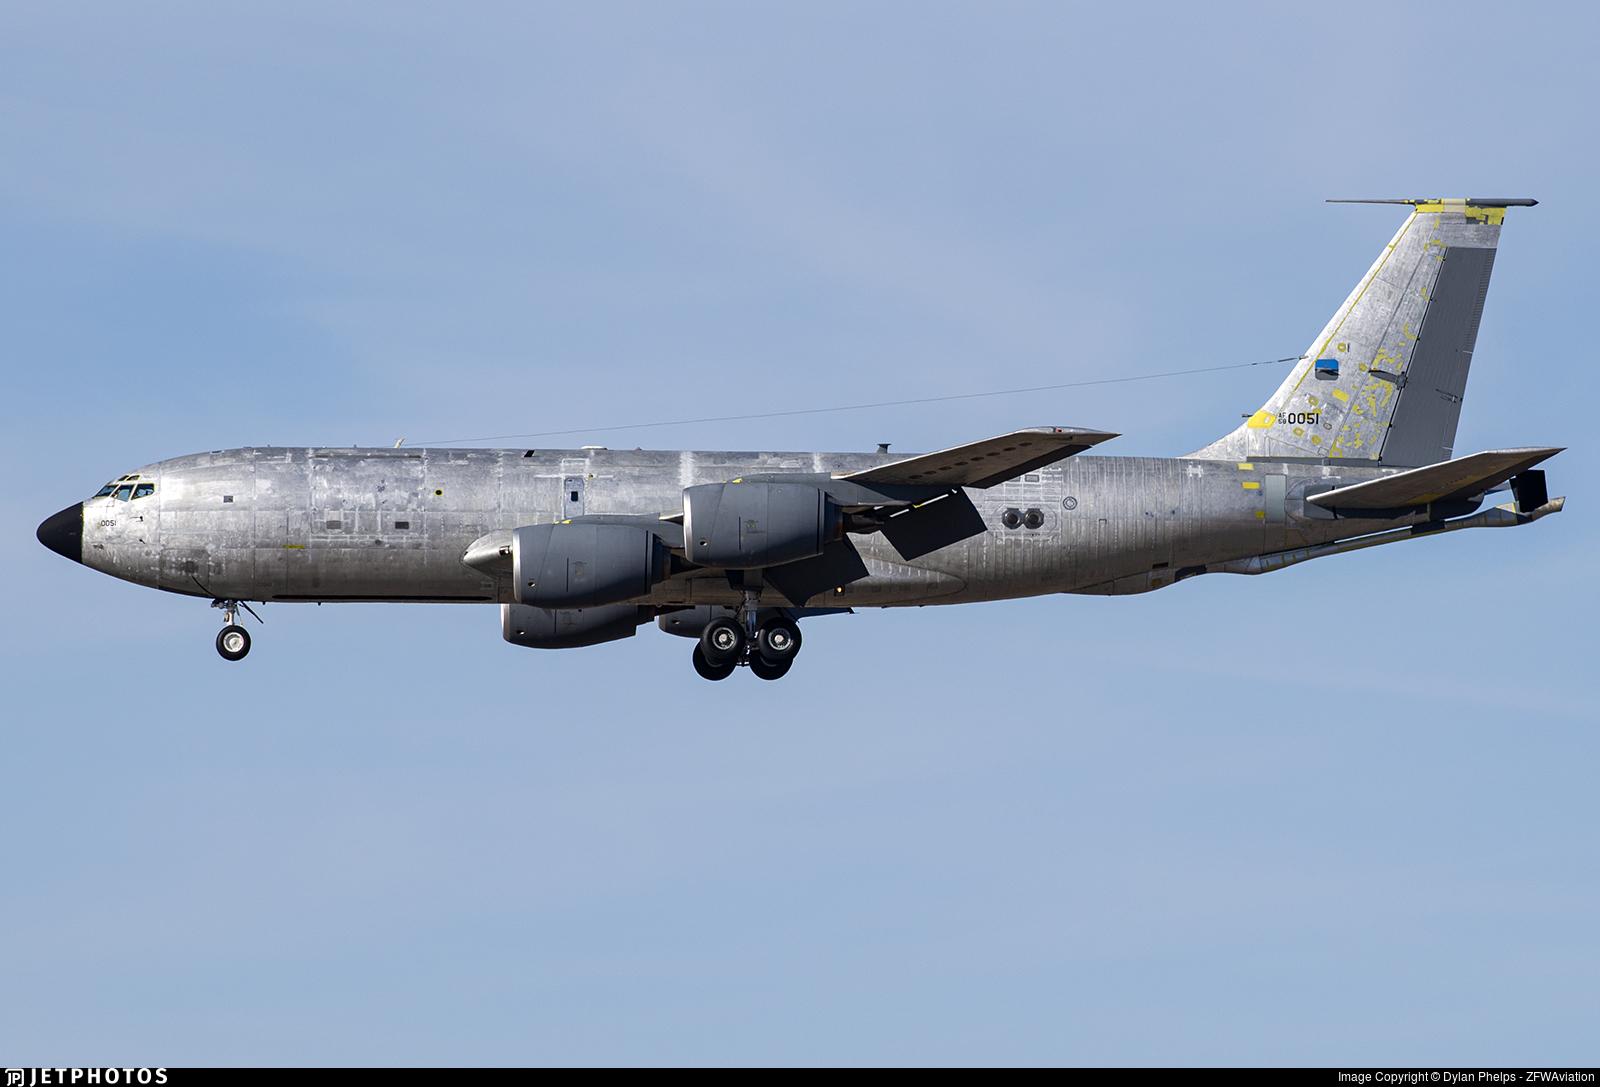 58-0051 - Boeing KC-135R Stratotanker - United States - US Air Force (USAF)